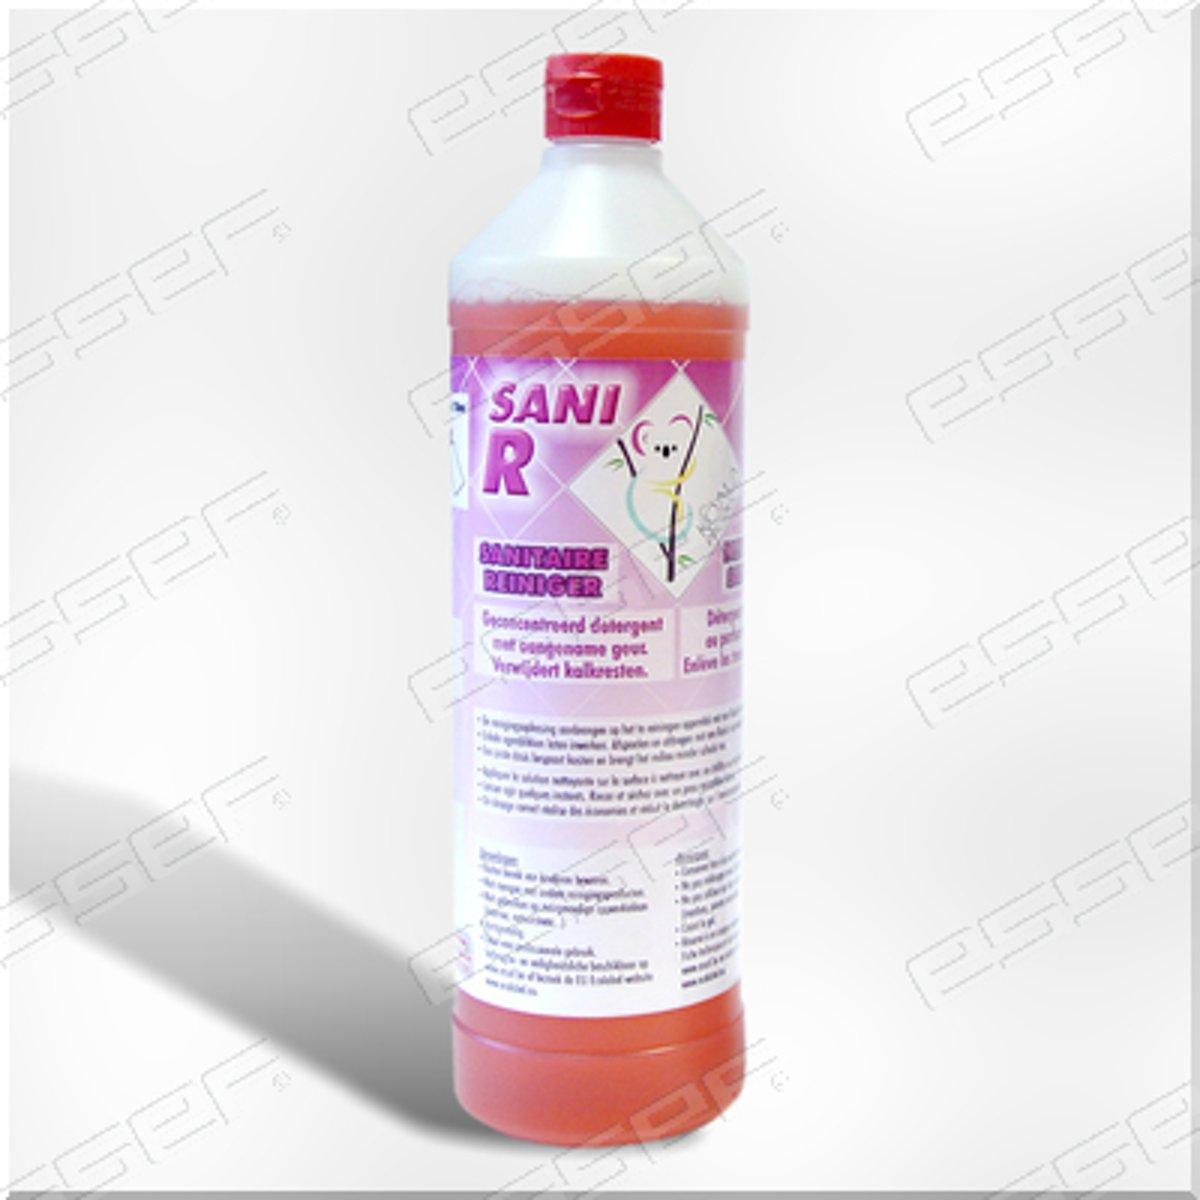 Geconcentreerde Sanitairreiniger Sani R - 1 Liter sanitaire reiniger met Ecolabel kopen